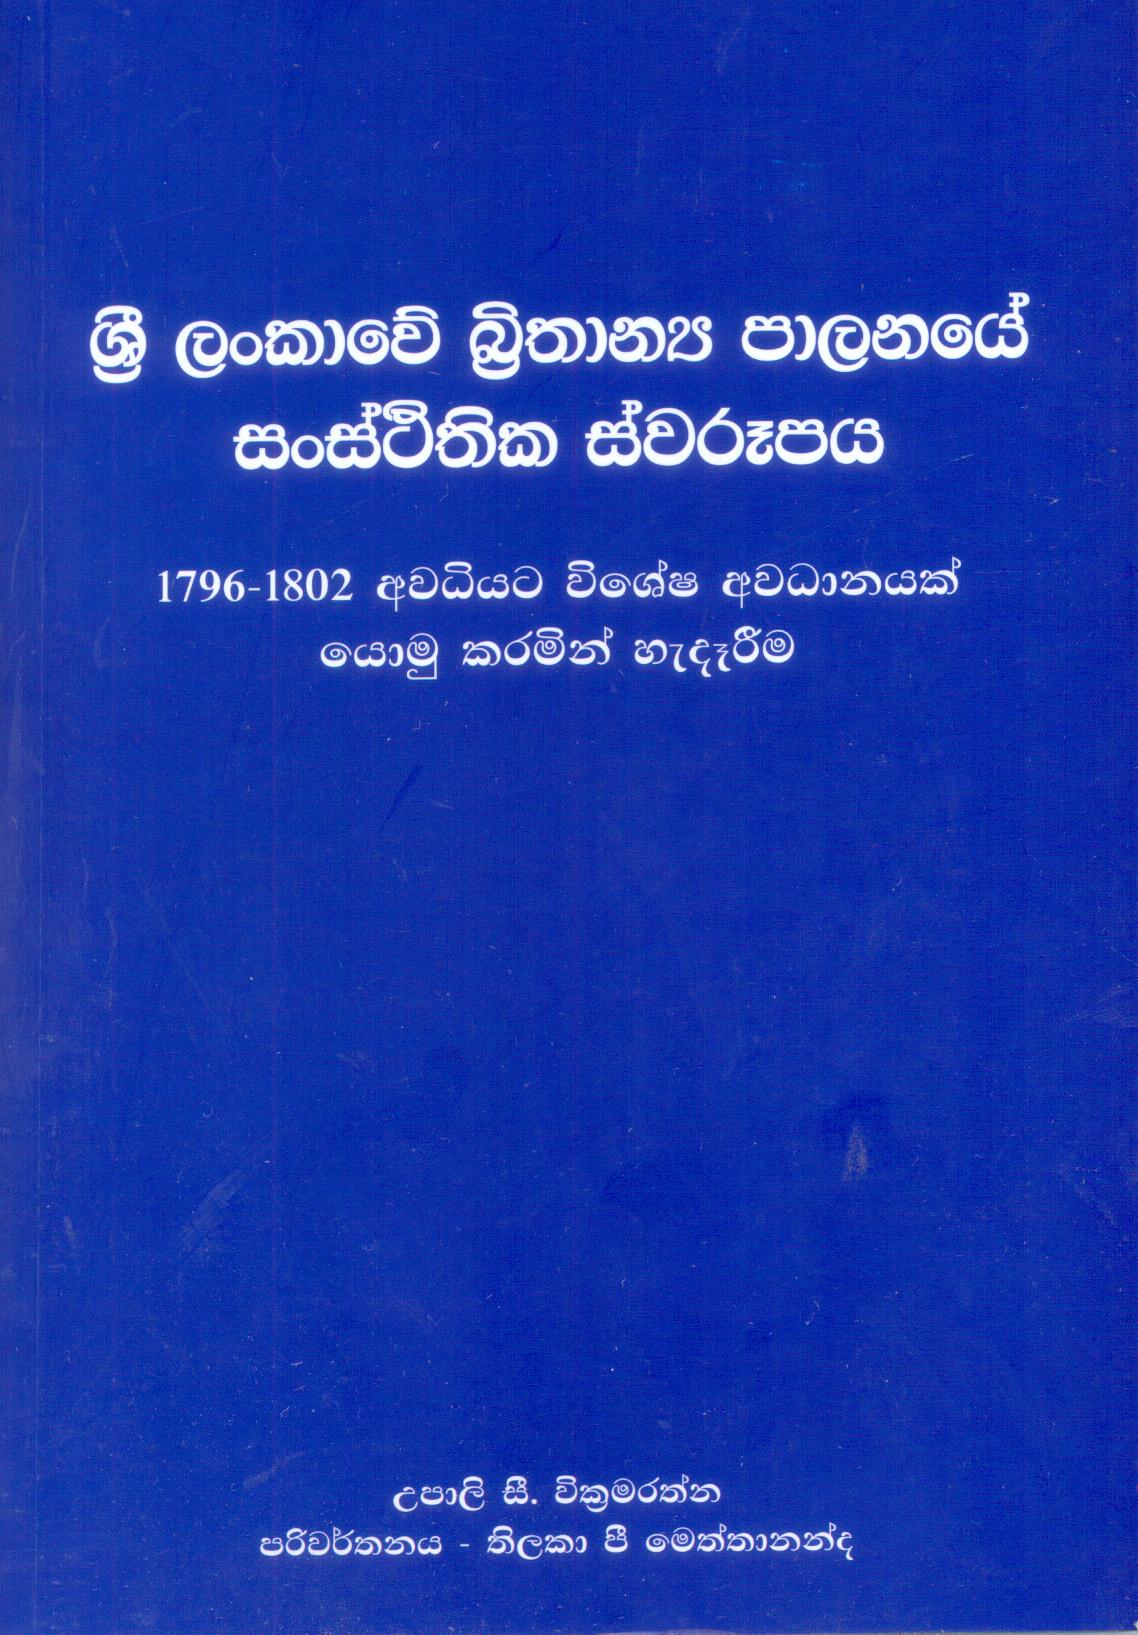 Sri Lankawe Brithanya Palanaye Sansthithika Swaroopaya